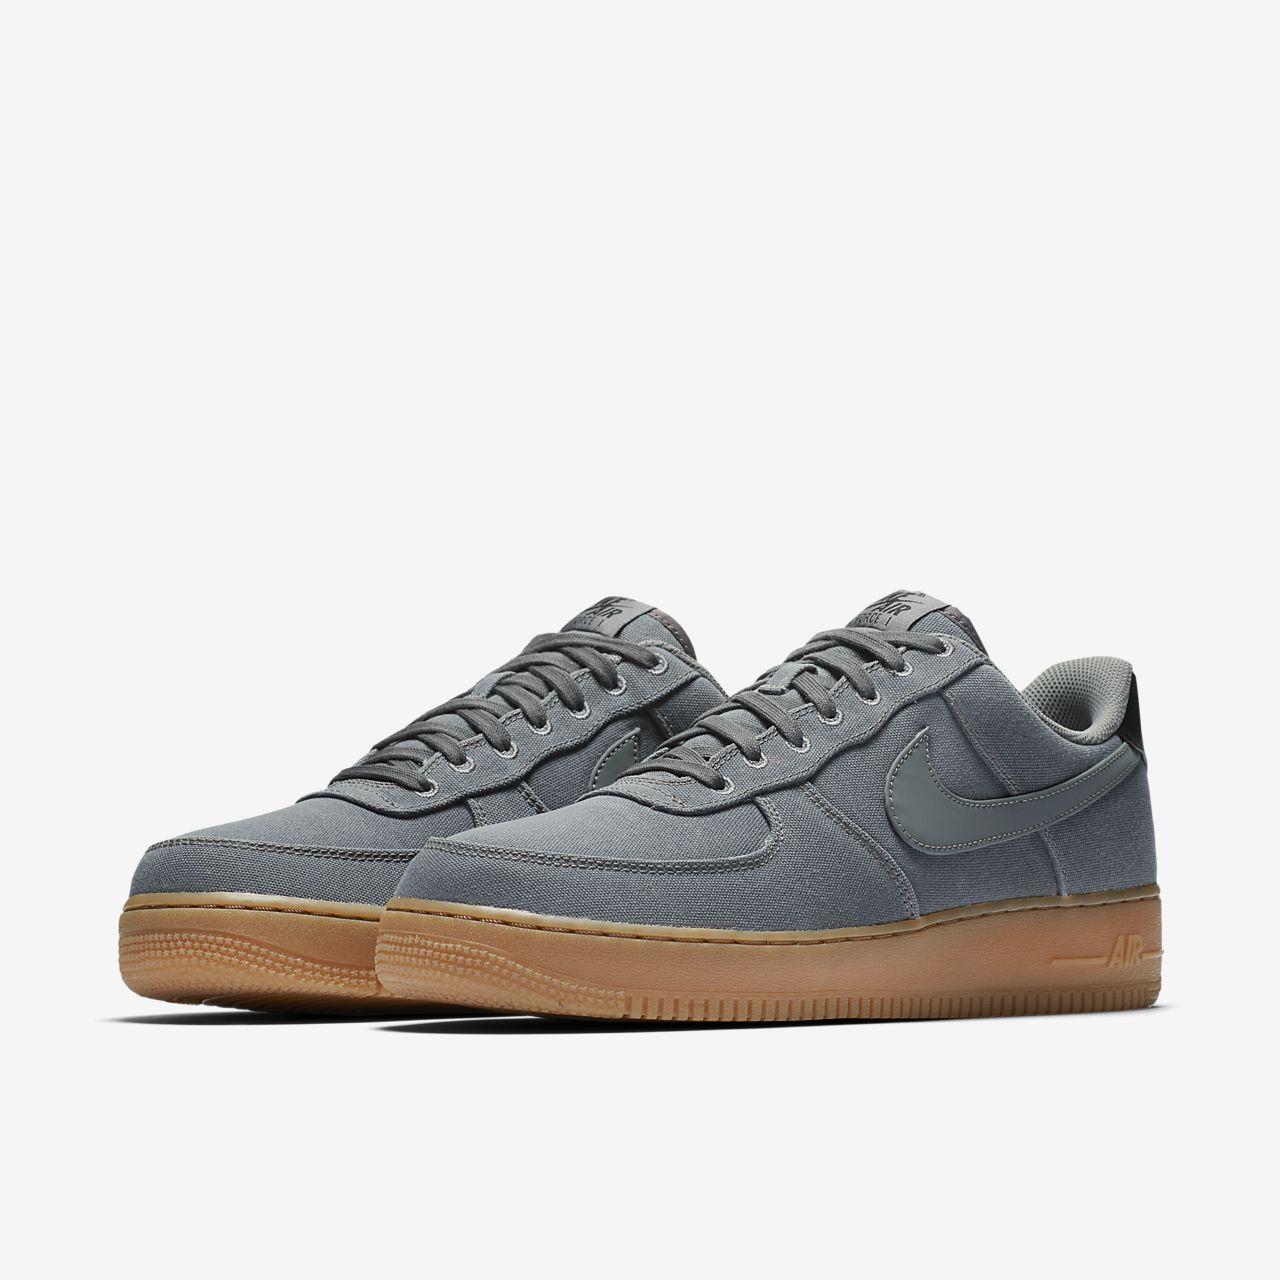 16558c4a5ea4 Nike Air Force 1  07 LV8 Style Men s Shoe. Nike.com